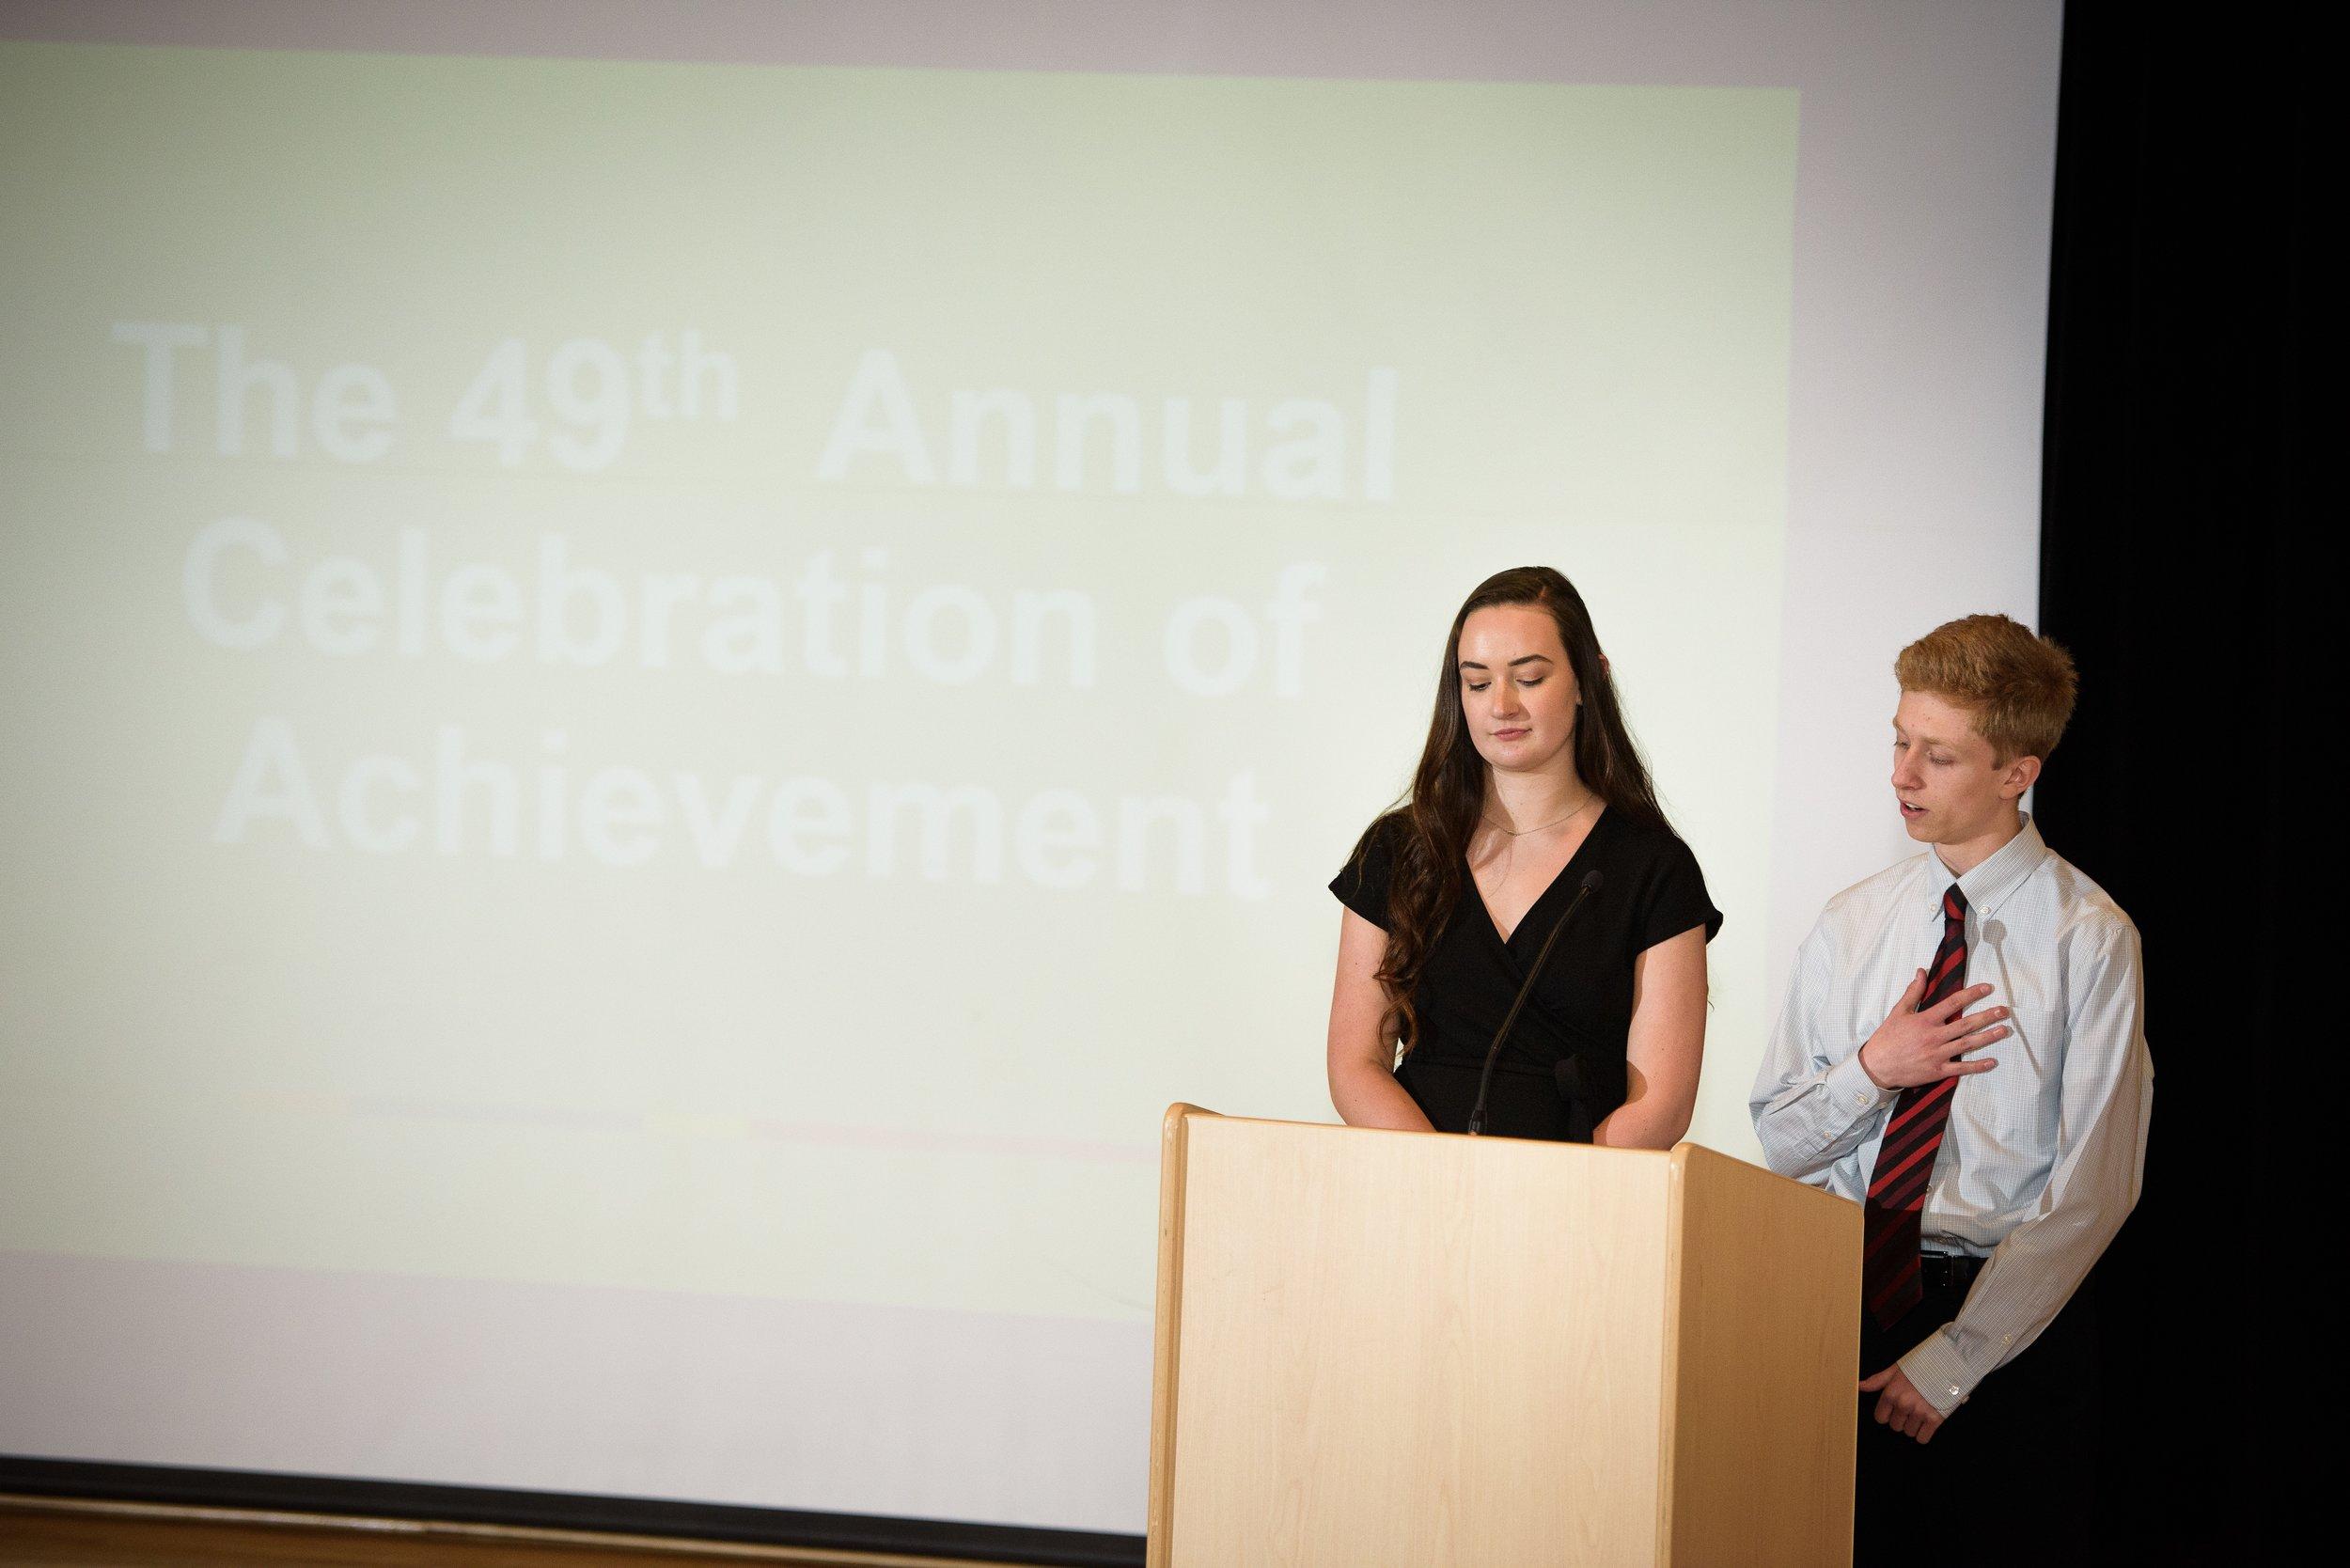 Awards2018-event_0174.jpg